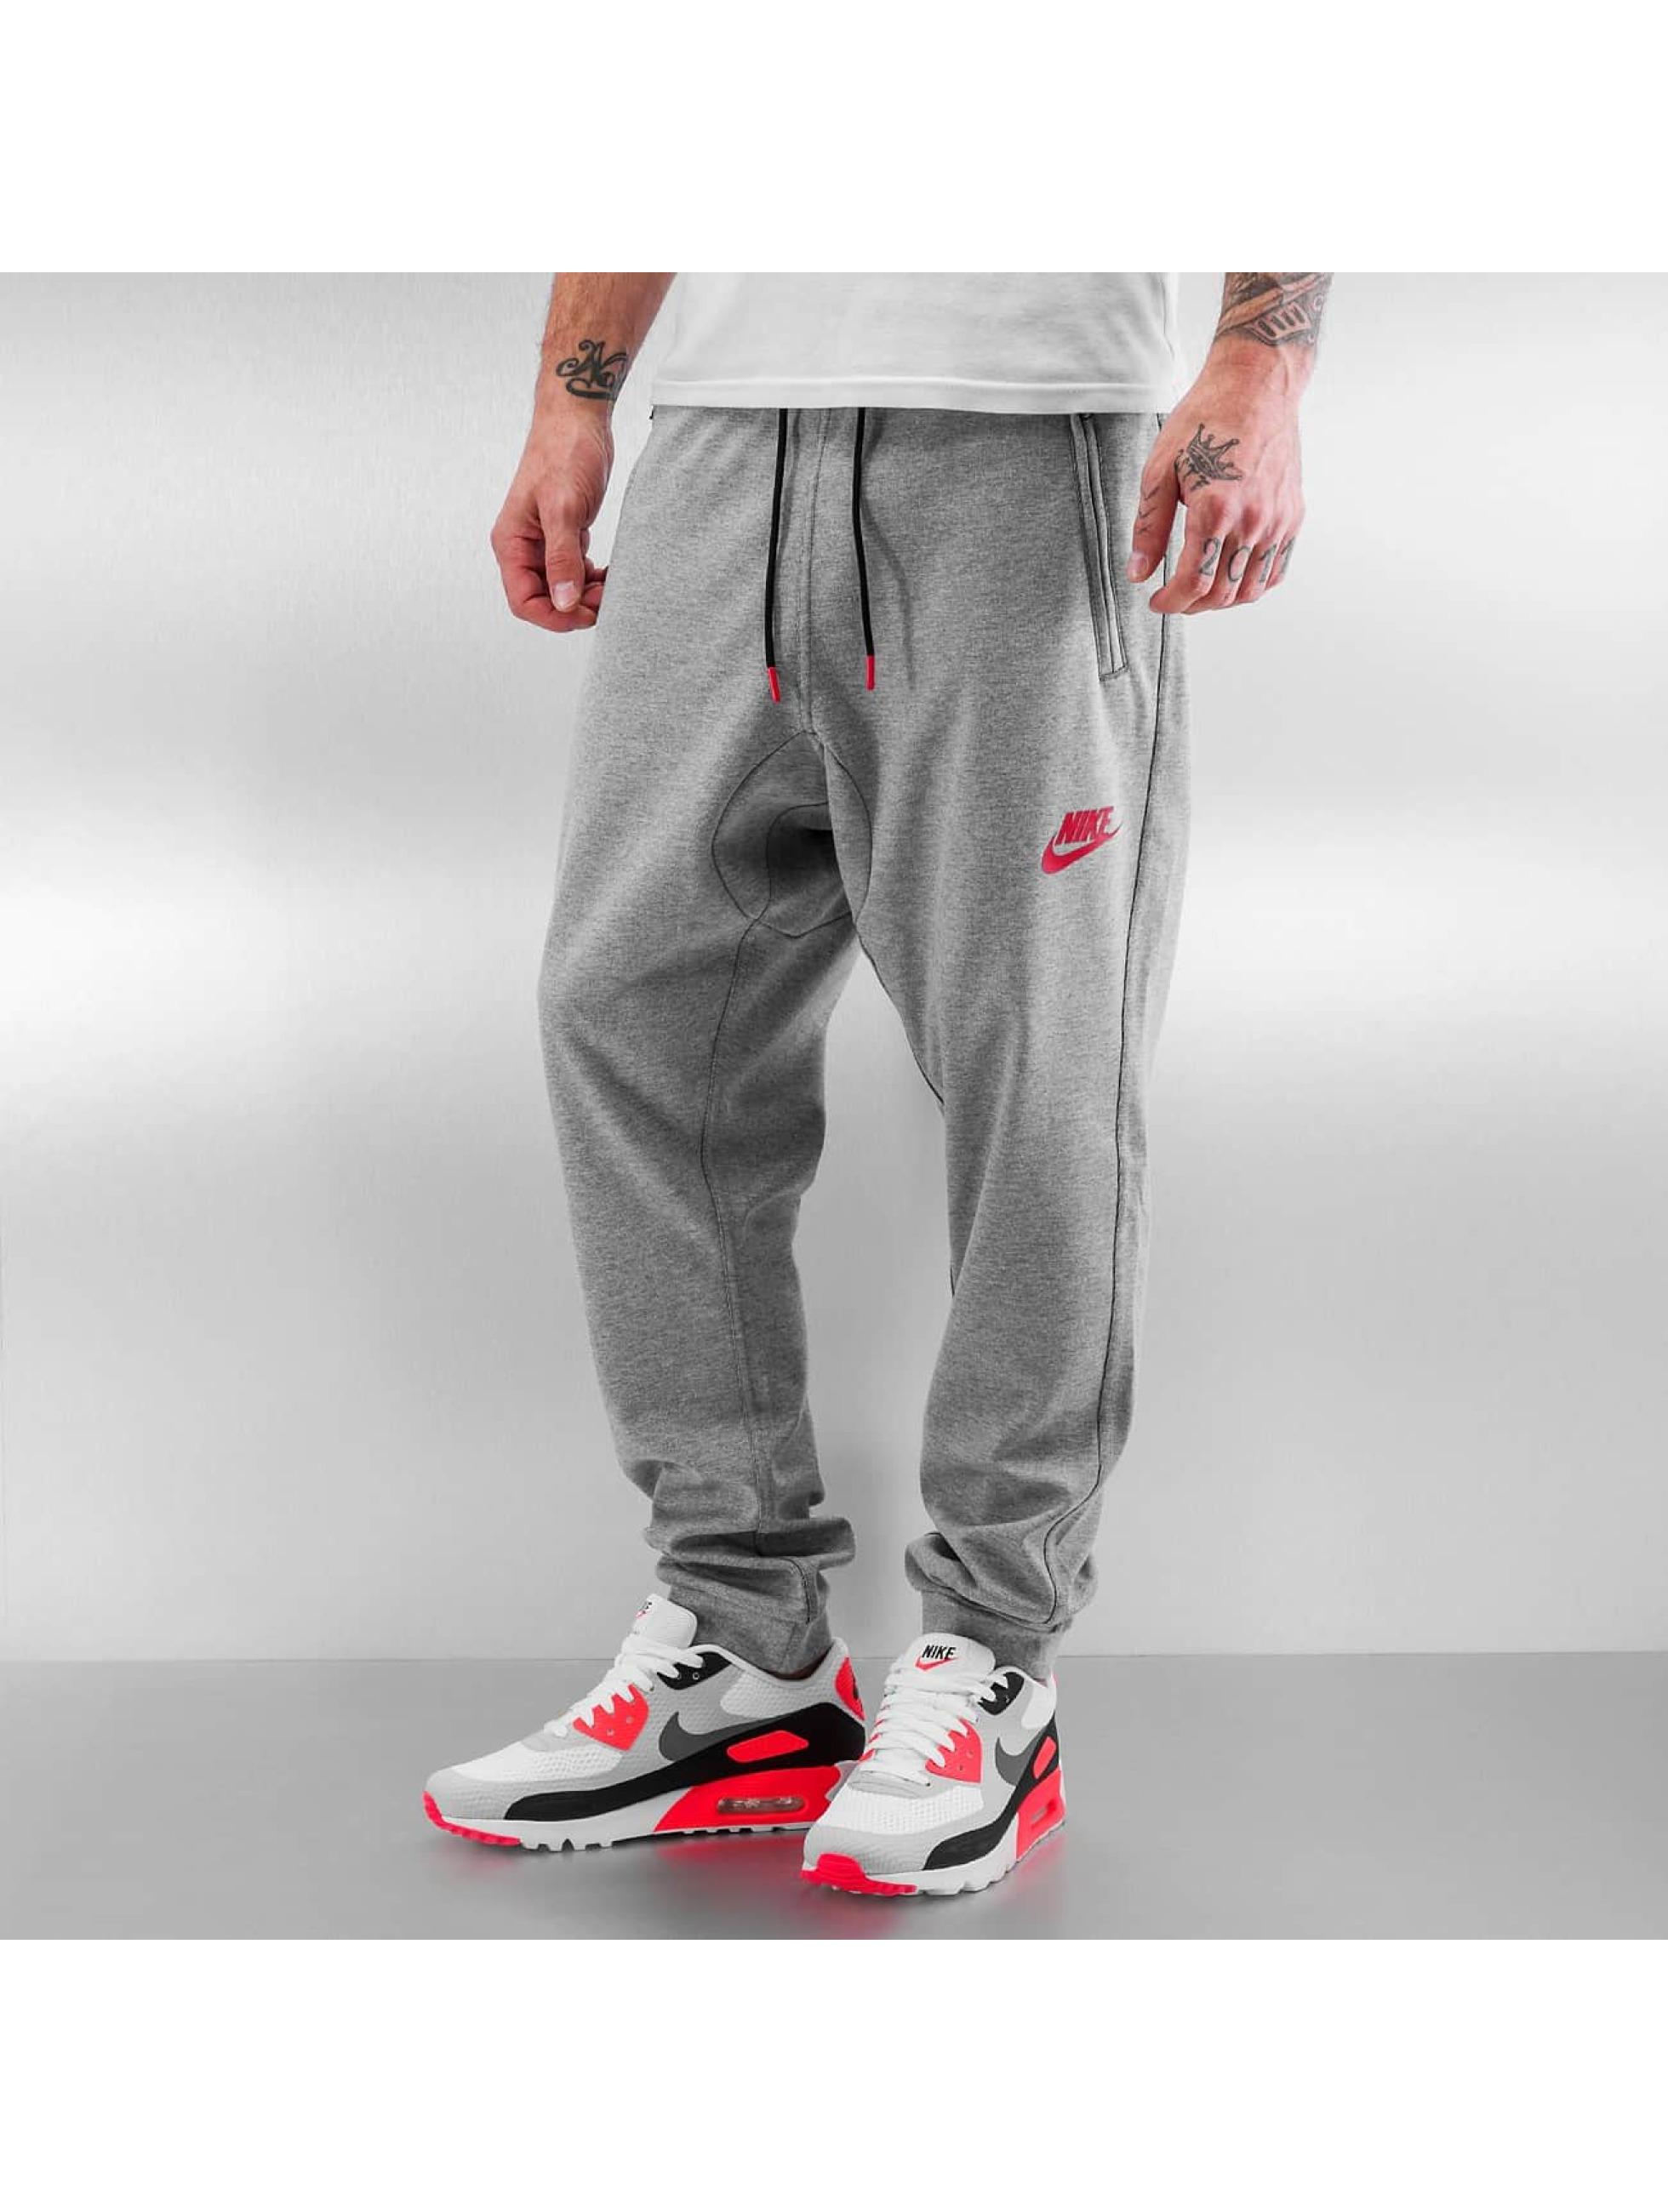 Nike Jogginghose Slim Fit